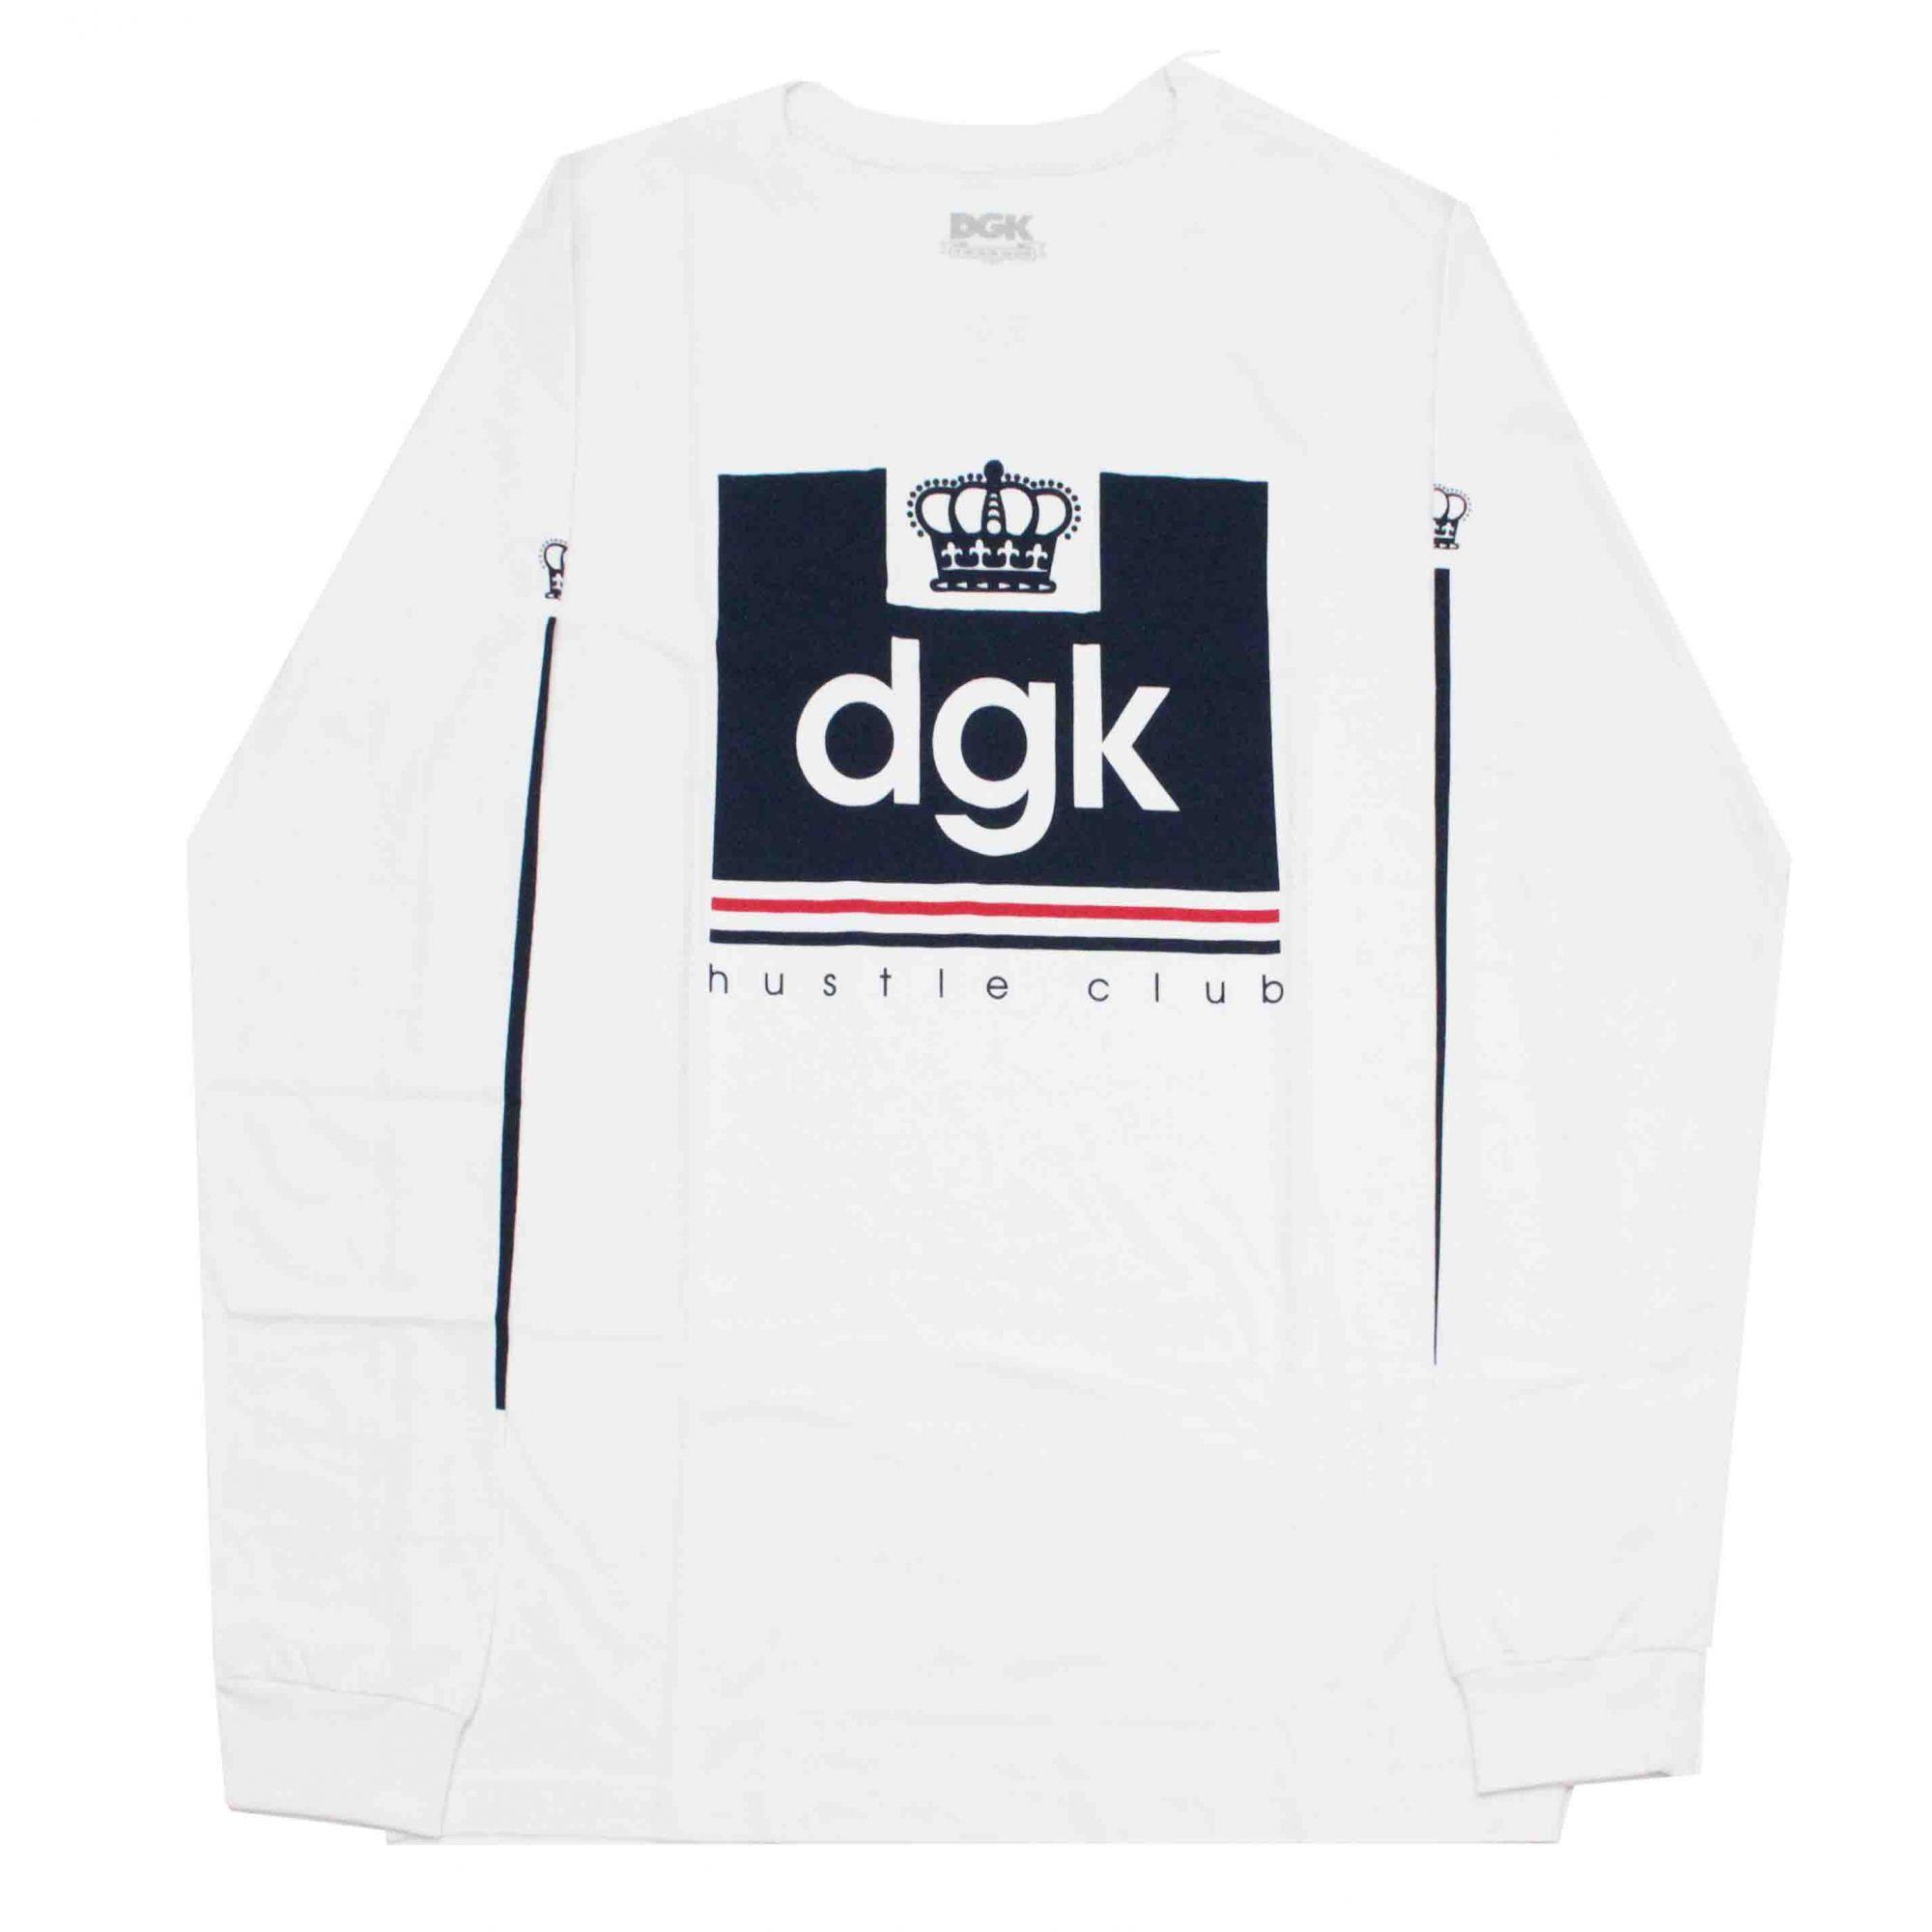 Camiseta Manga Longa DGK Hustle Club White